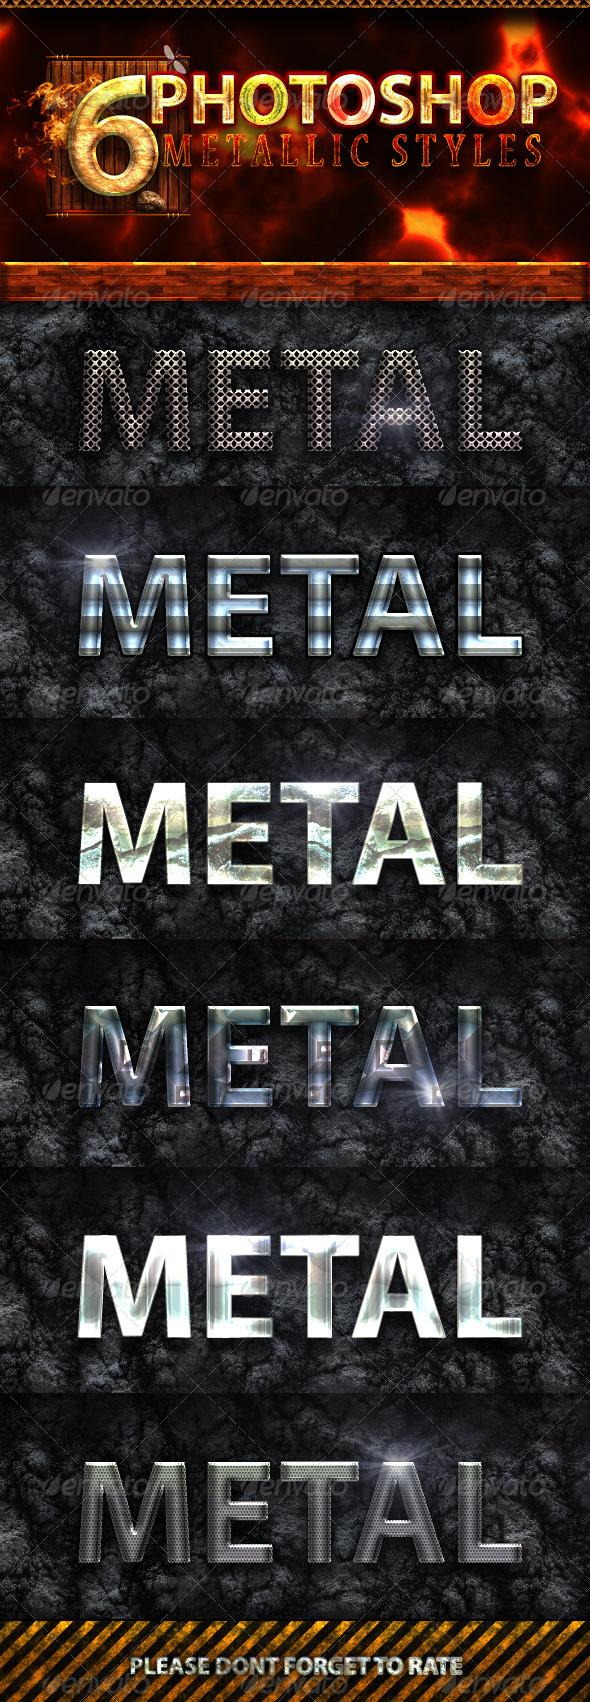 GraphicRiver 6 Photoshop Metallic Text Styles 4659520